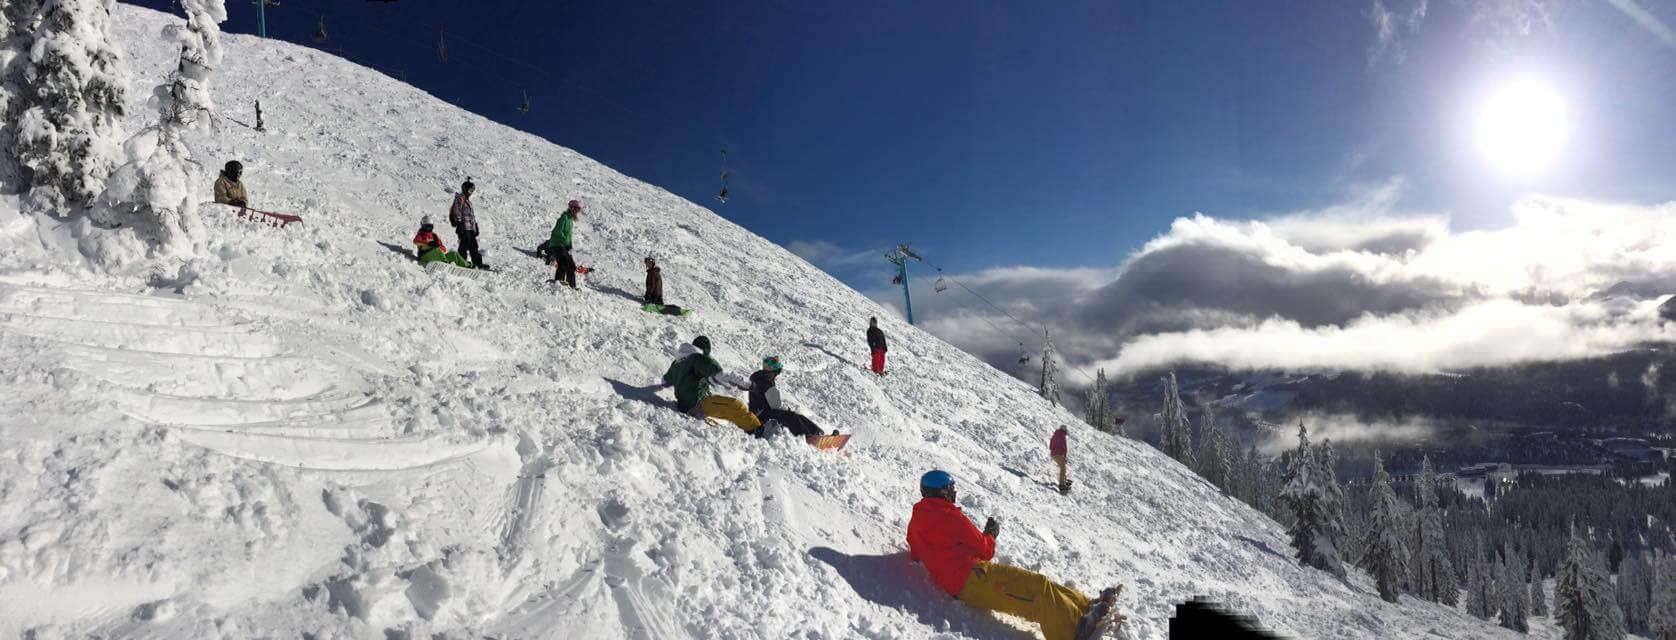 G.P. Vanier Ski and Snowboard Team